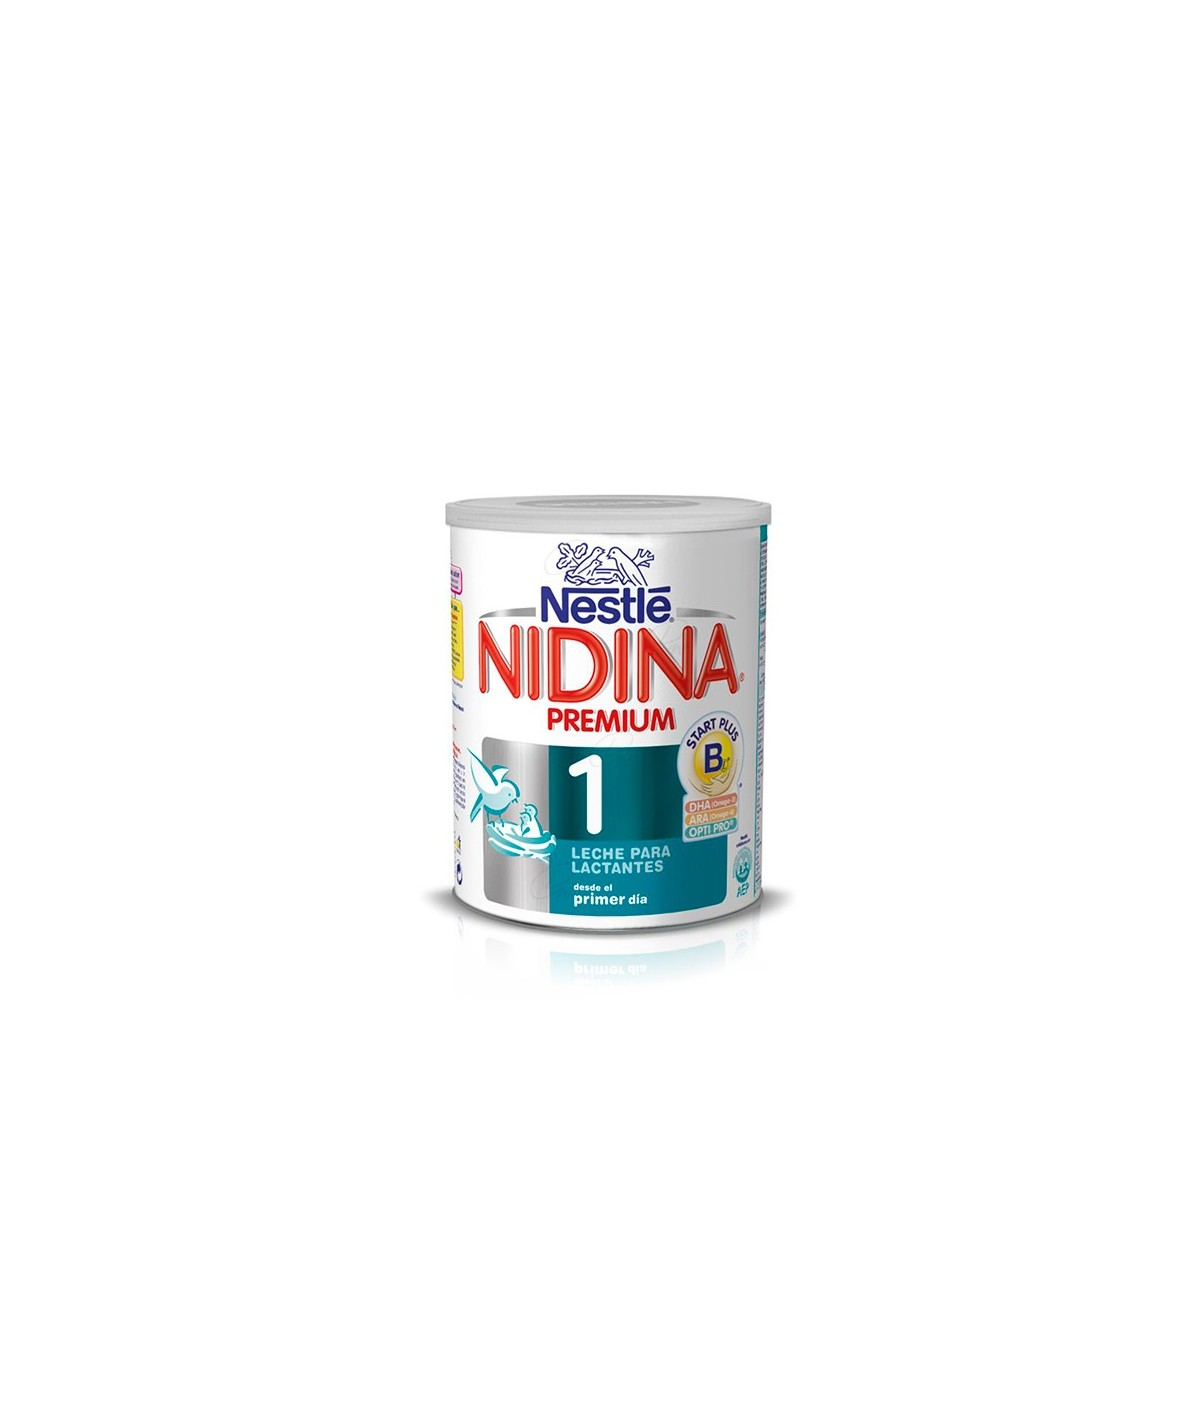 Nidina 1 Premium 900g